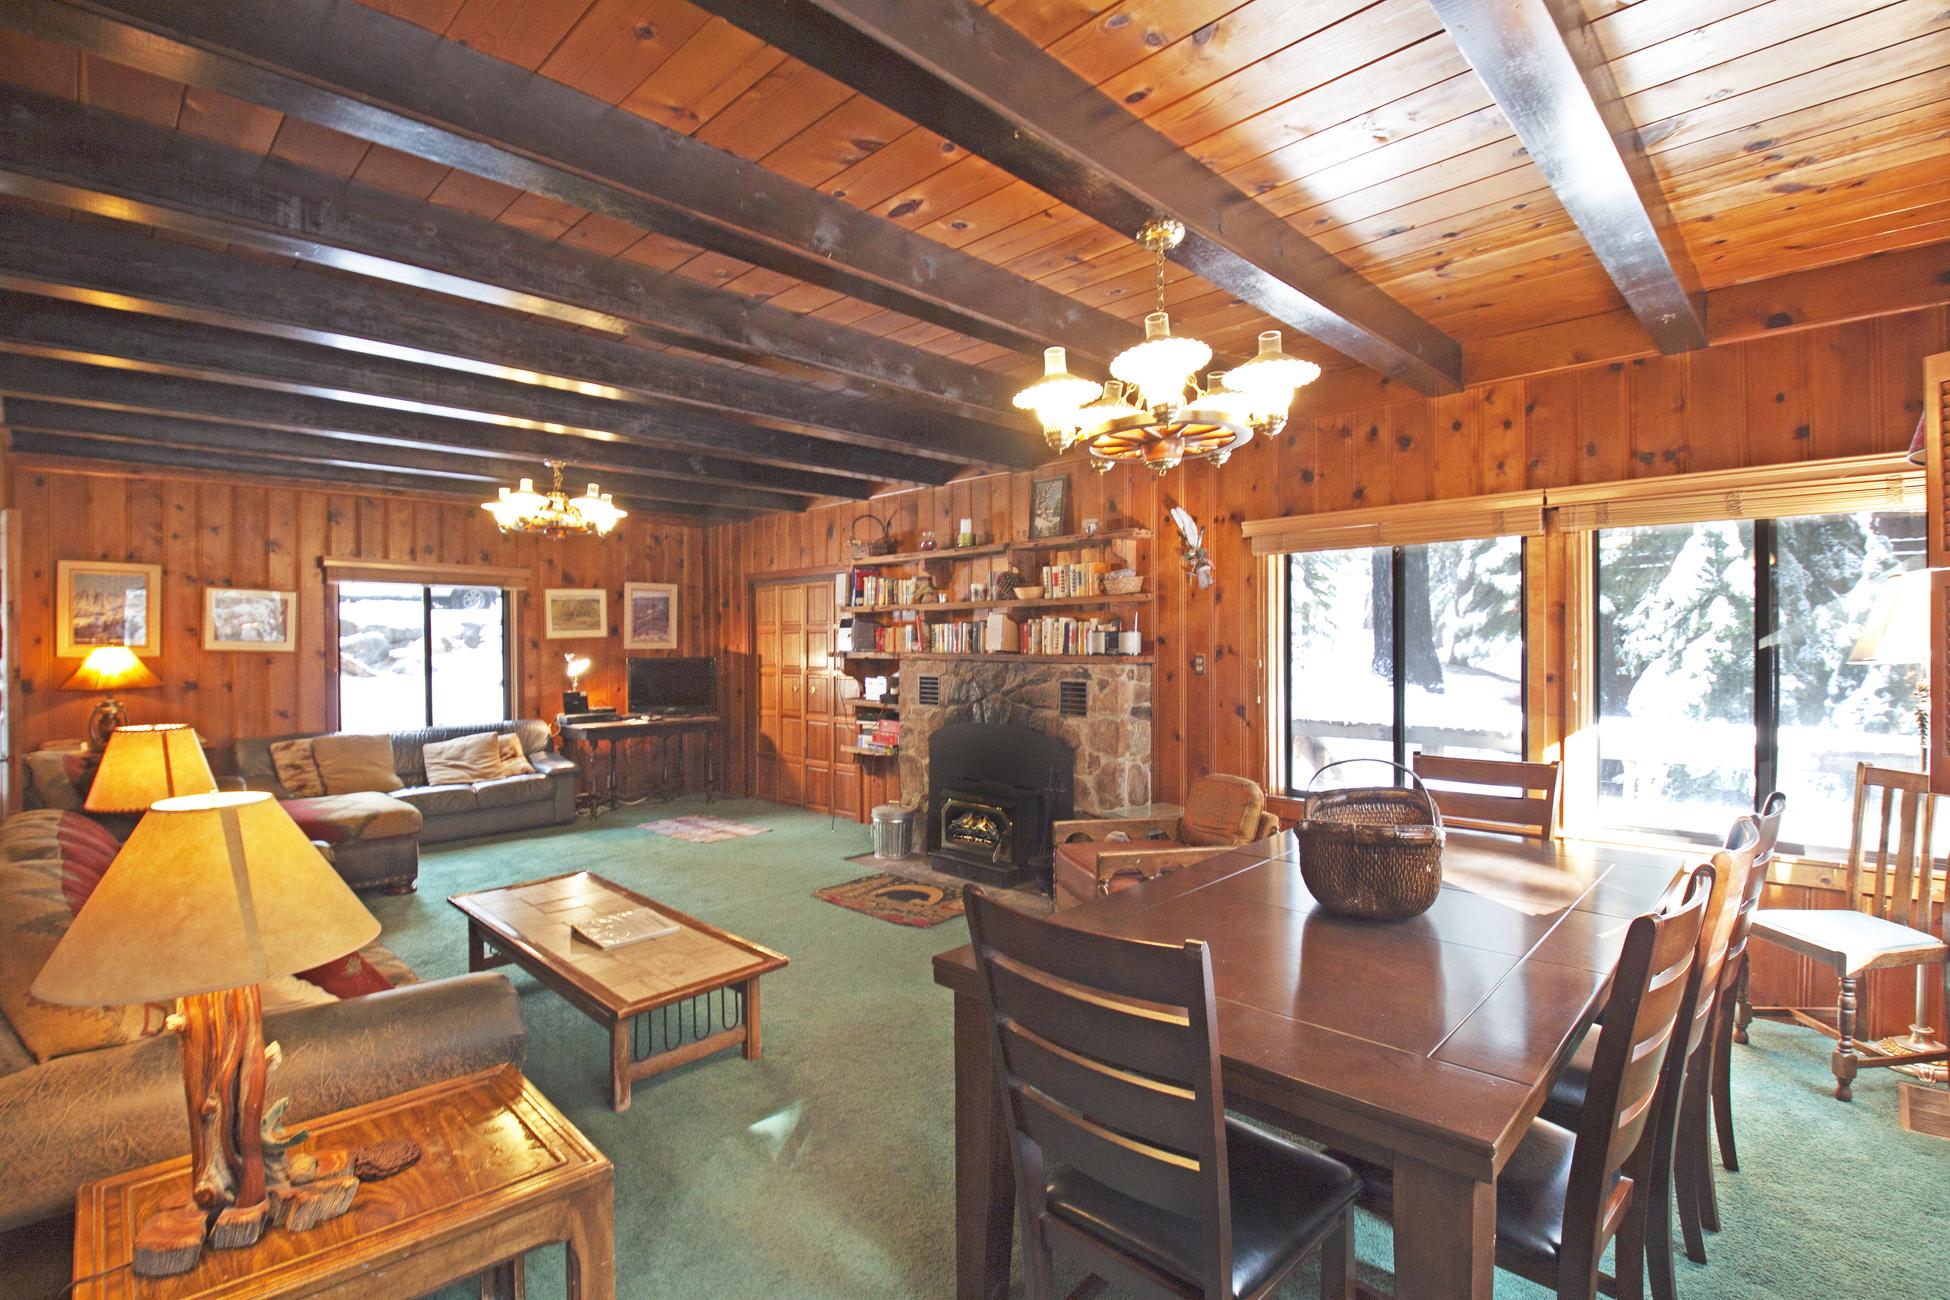 Listing Image 7 for Quandt Cabin